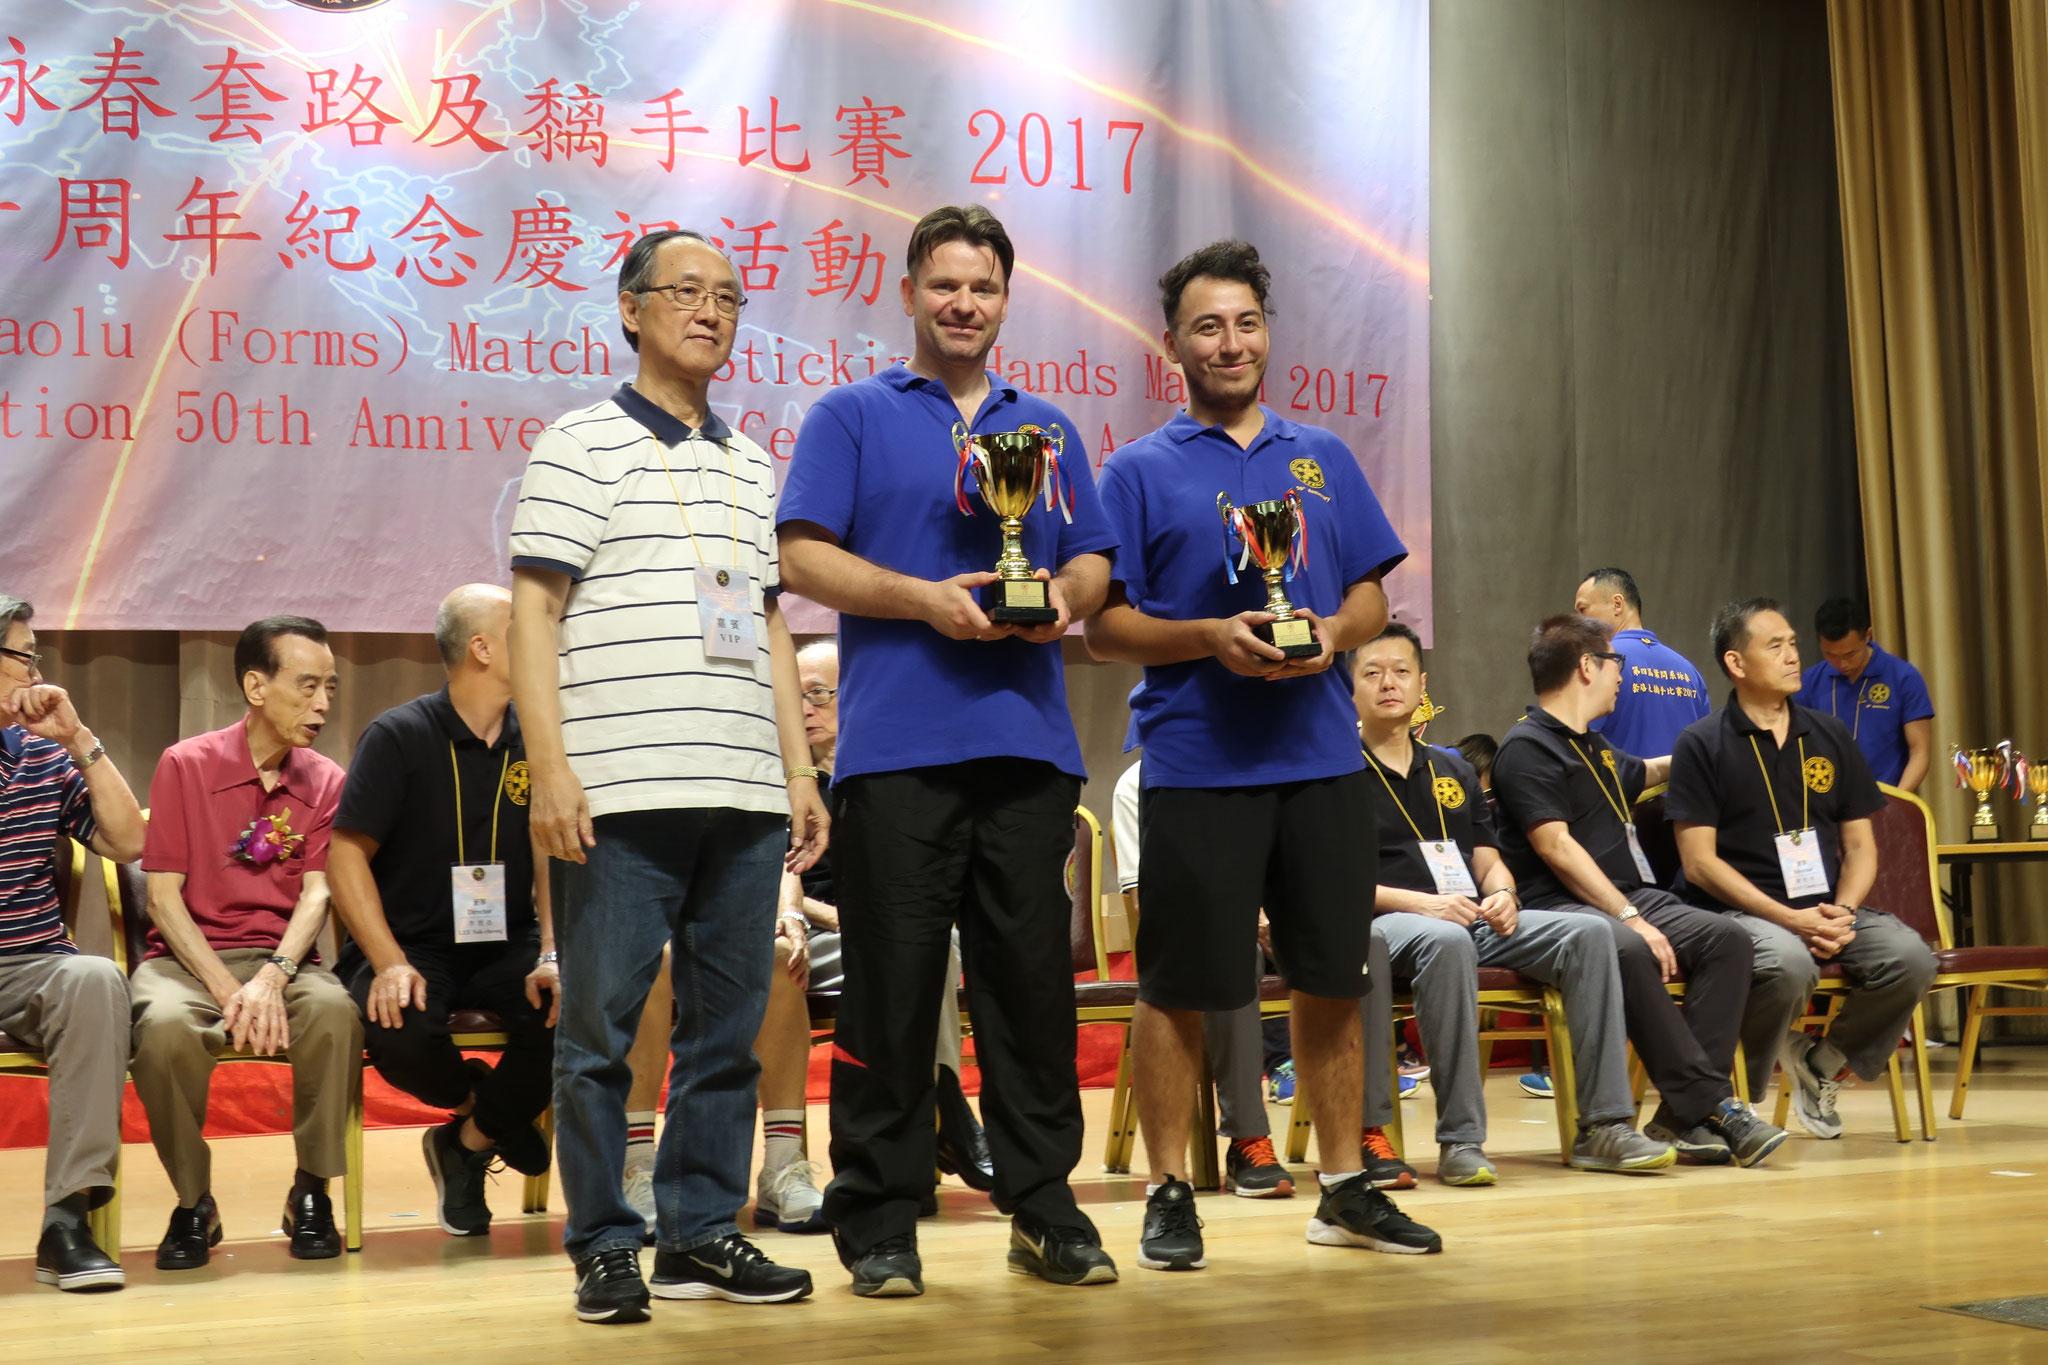 wing chun münchen Turnier Hongkong 7